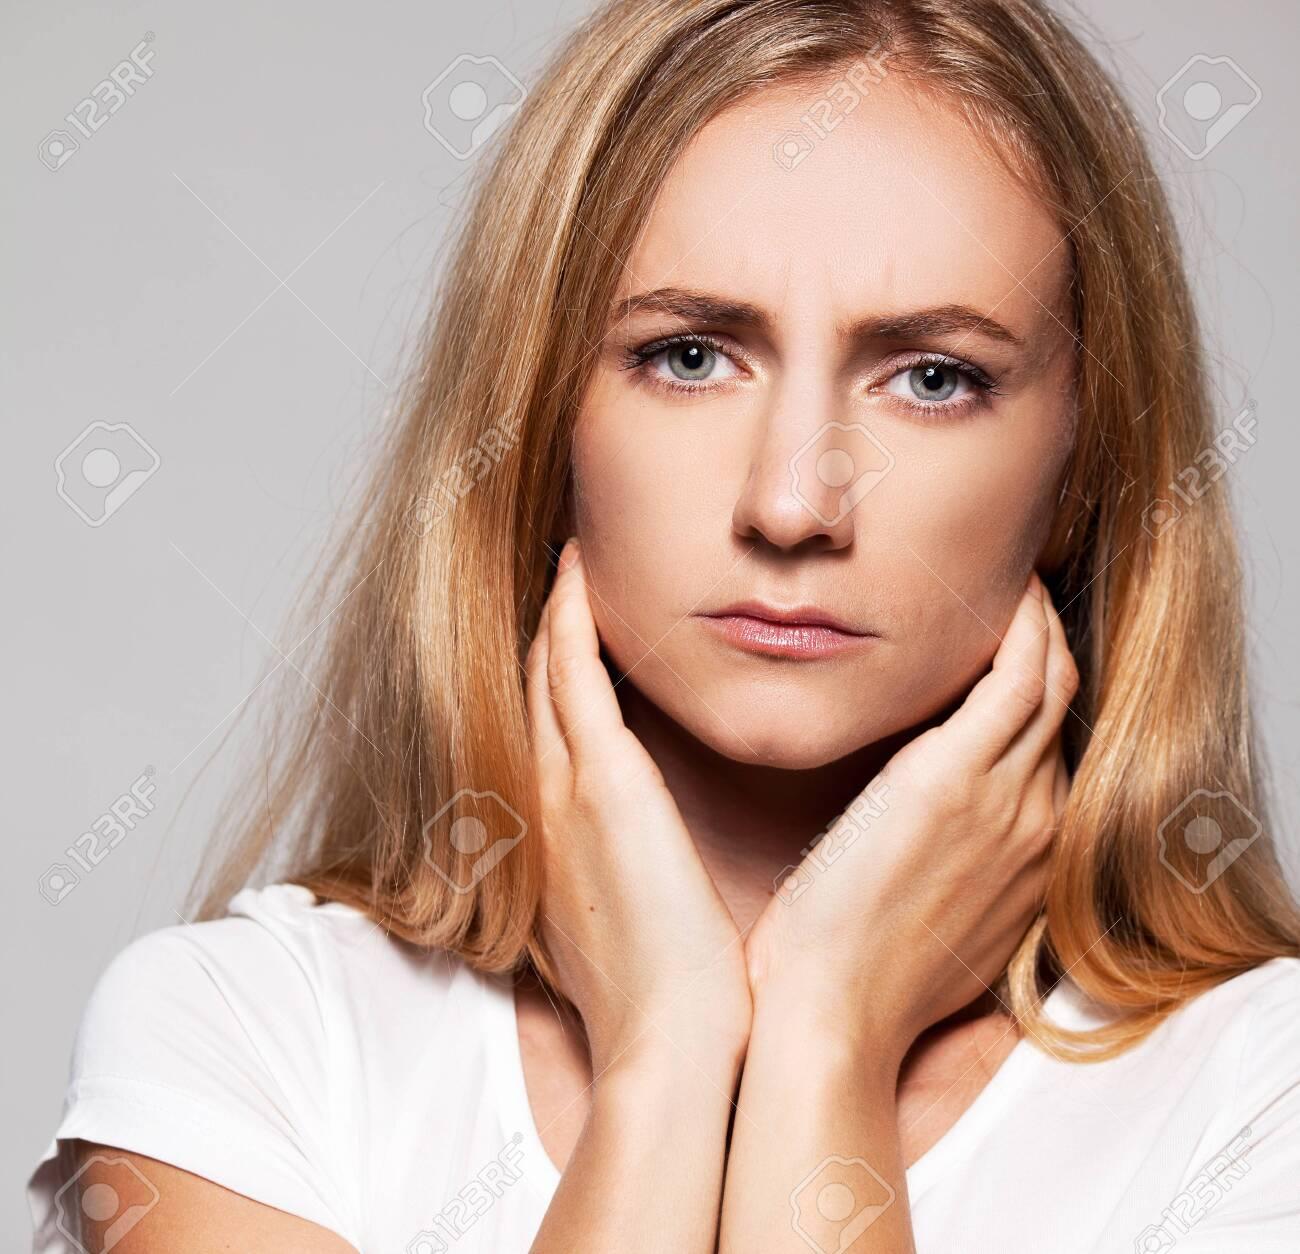 Sad female. Upset woman Problems - 142892454